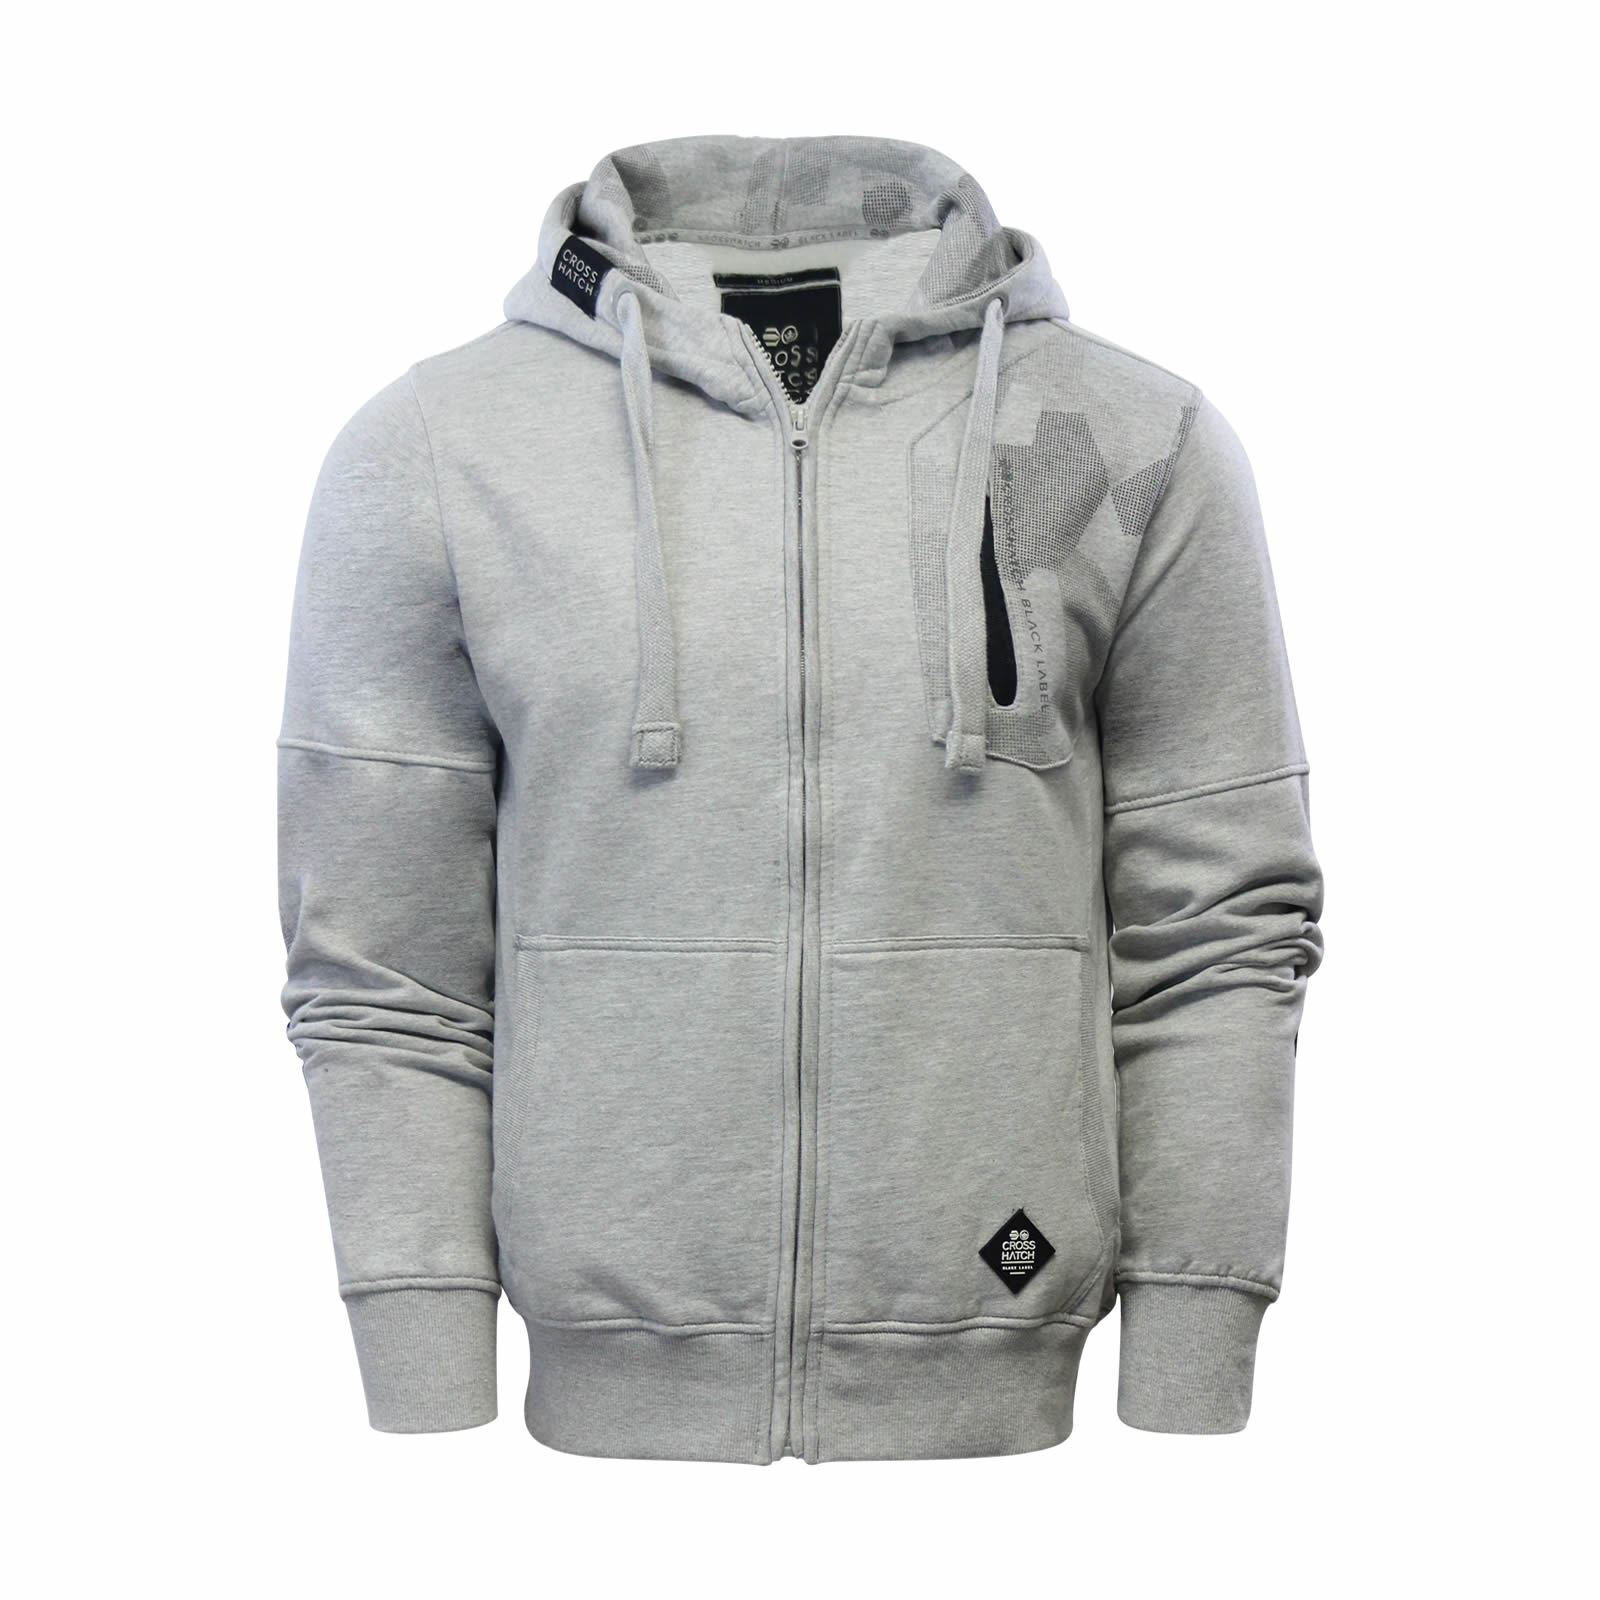 Mens-Hoodie-Crosshatch-Radzim-Cotton-Zip-Up-Hooded-Sweater